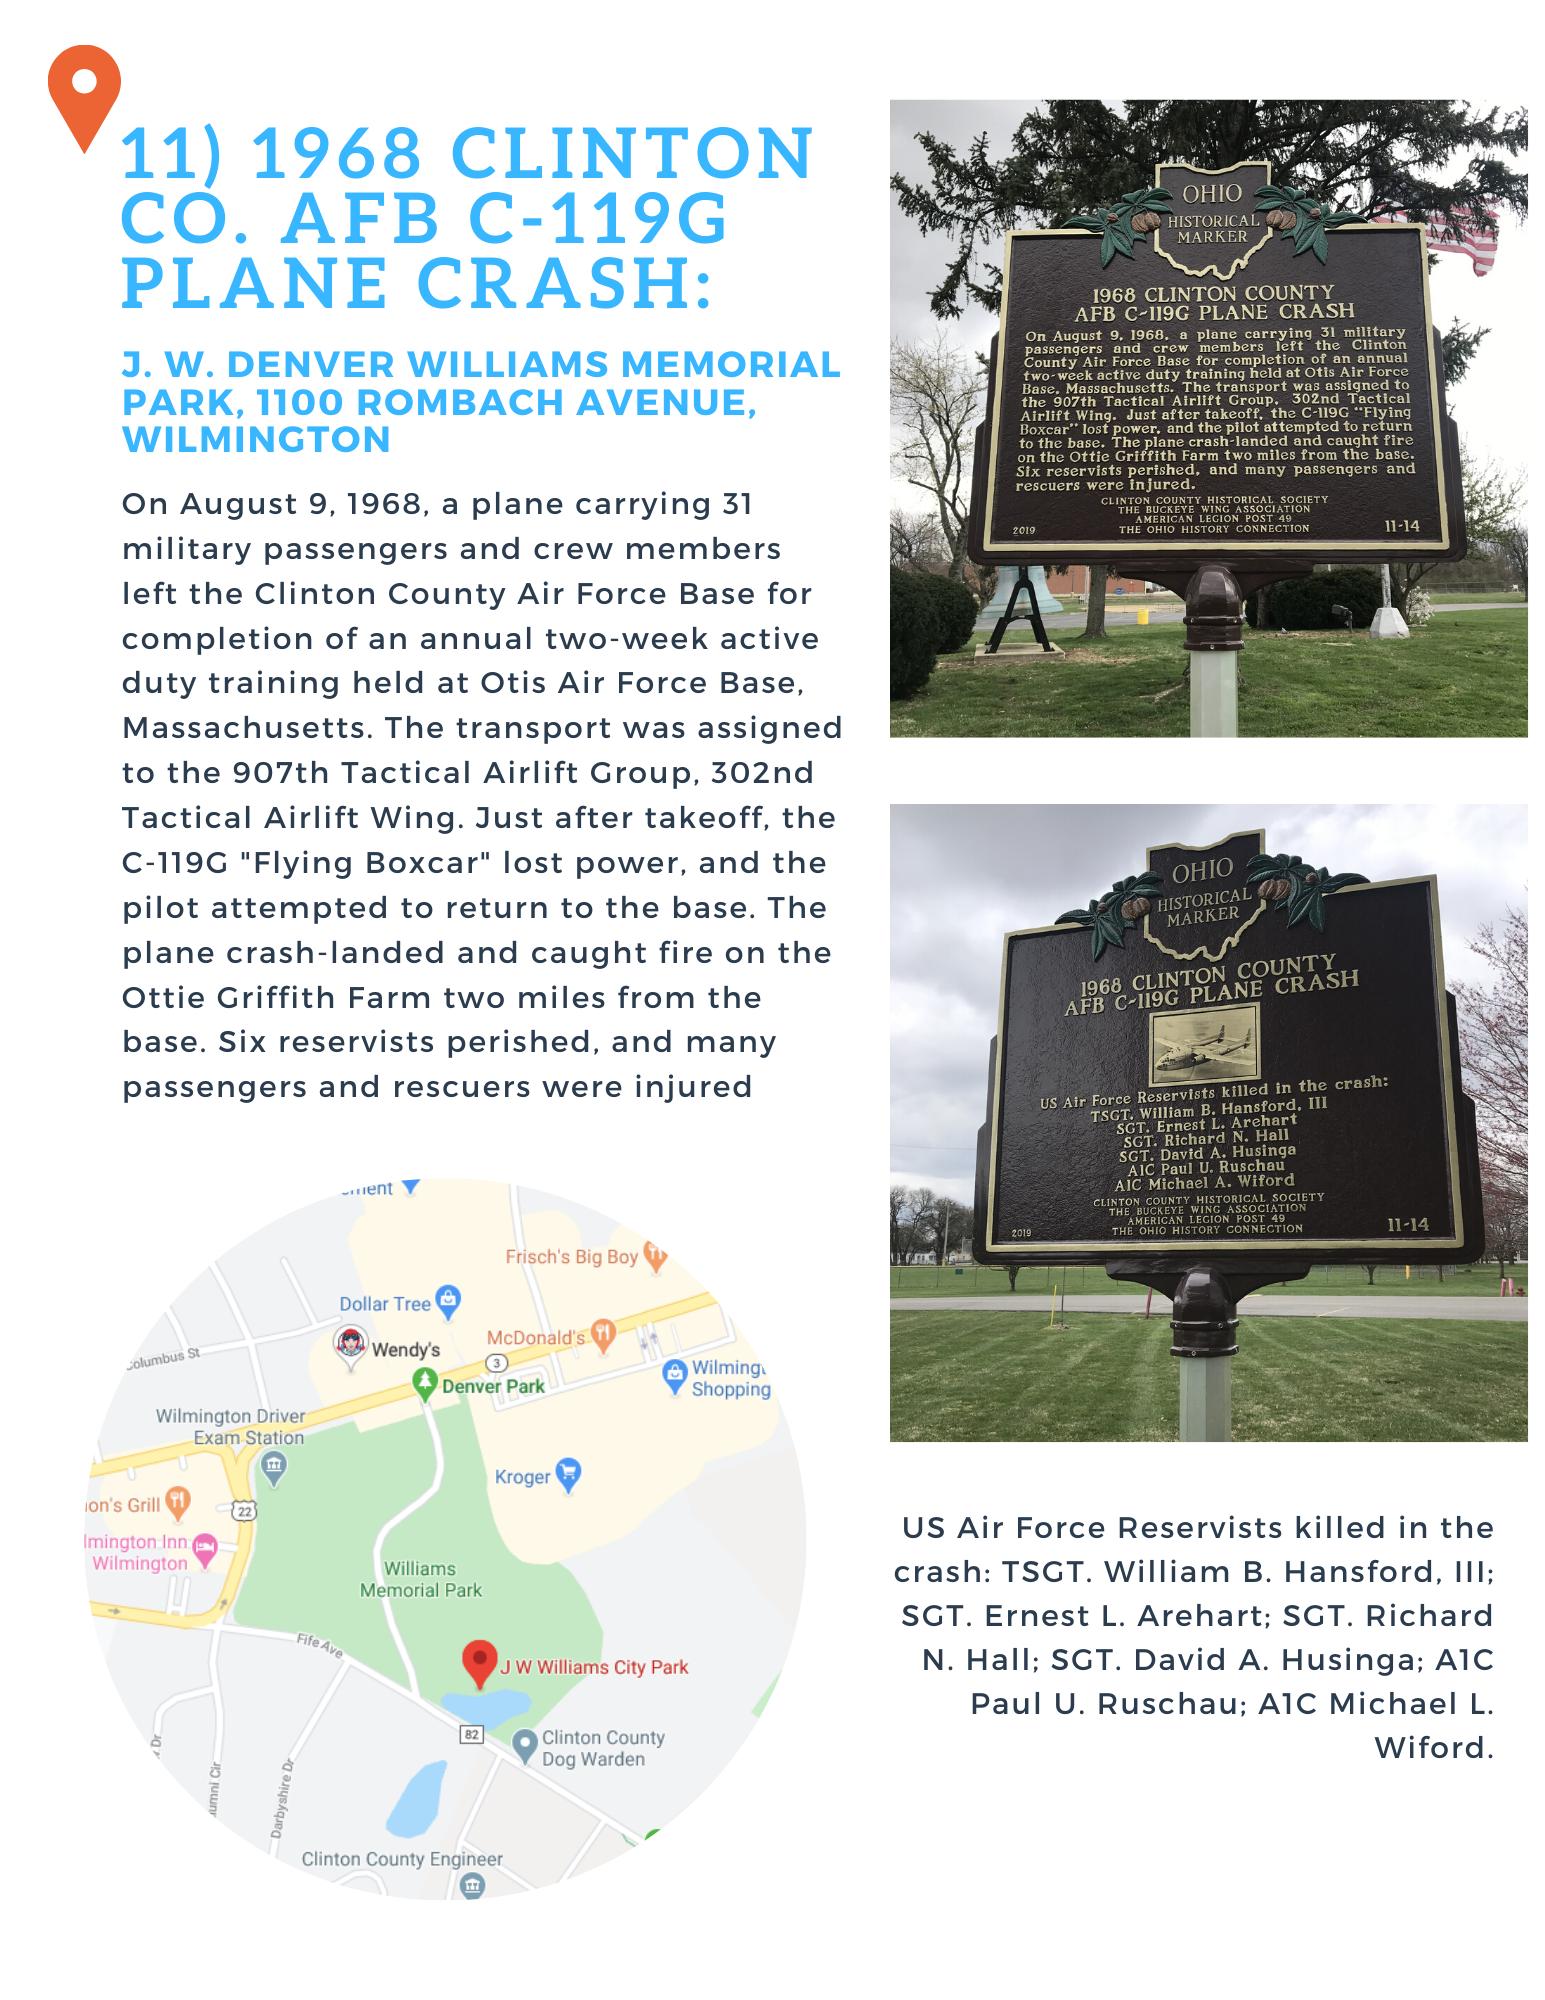 CCAFB Crash #11